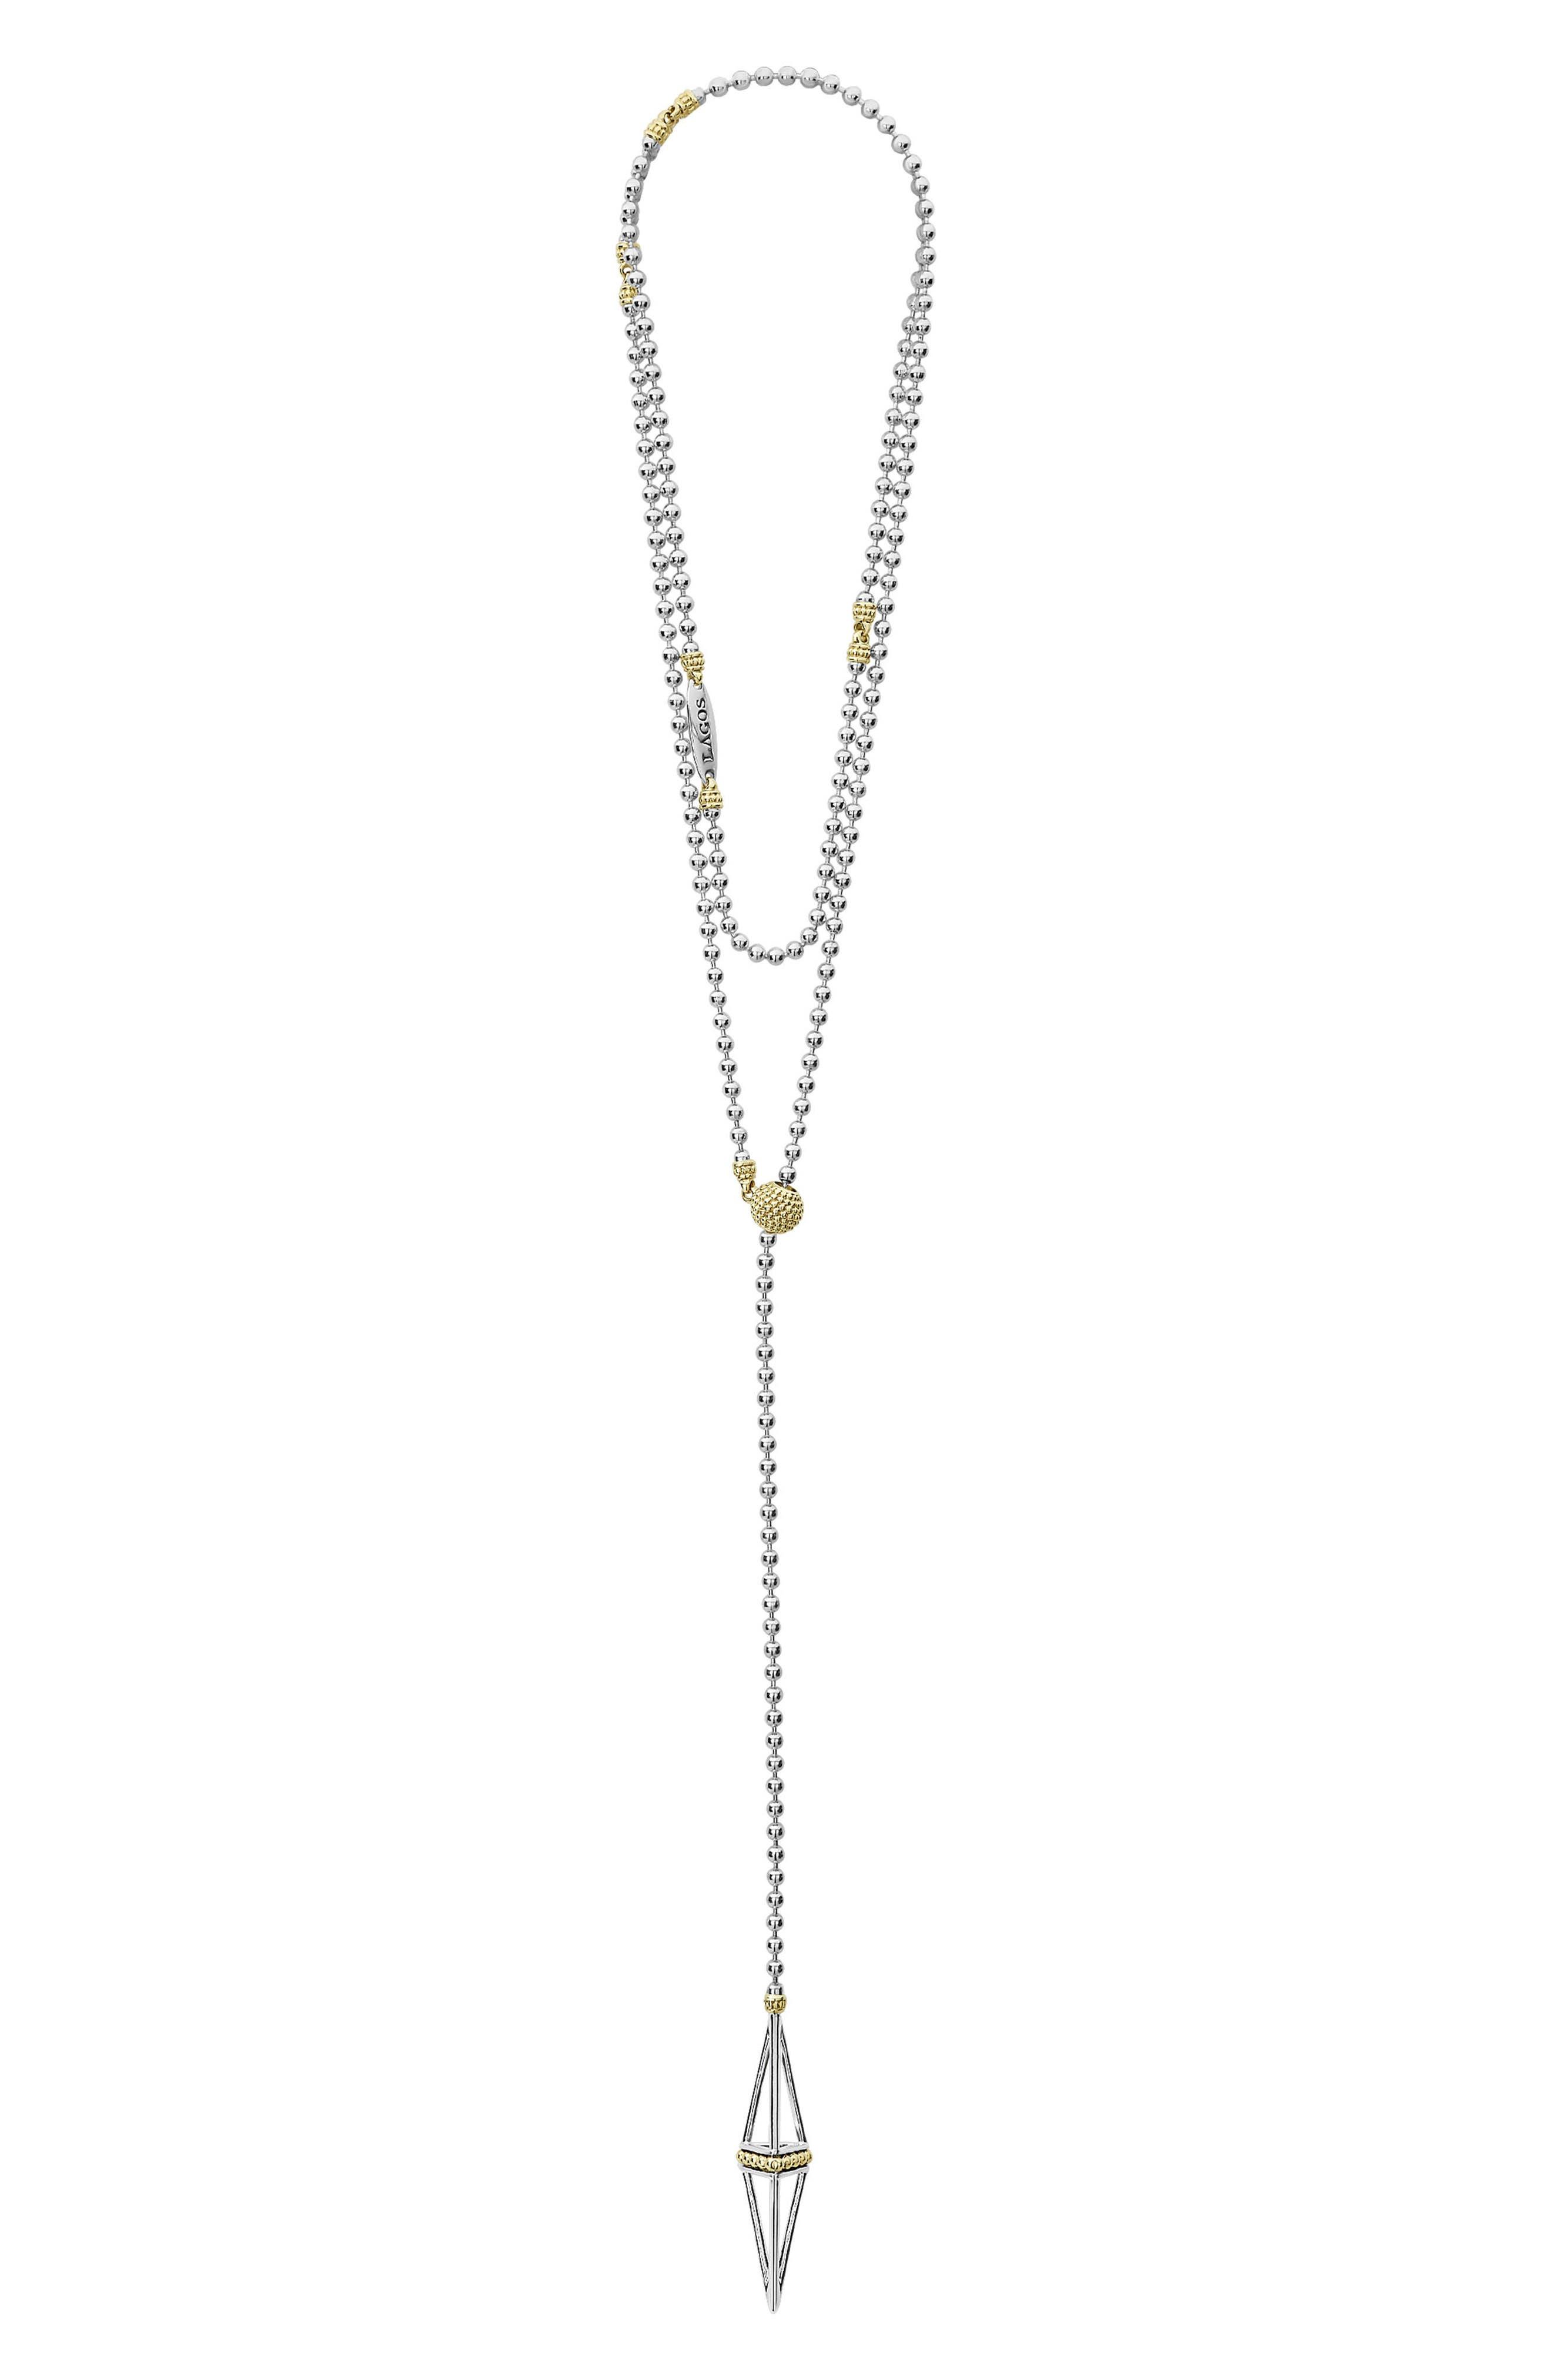 KSL Pyramid Lariat Necklace,                             Main thumbnail 1, color,                             SILVER